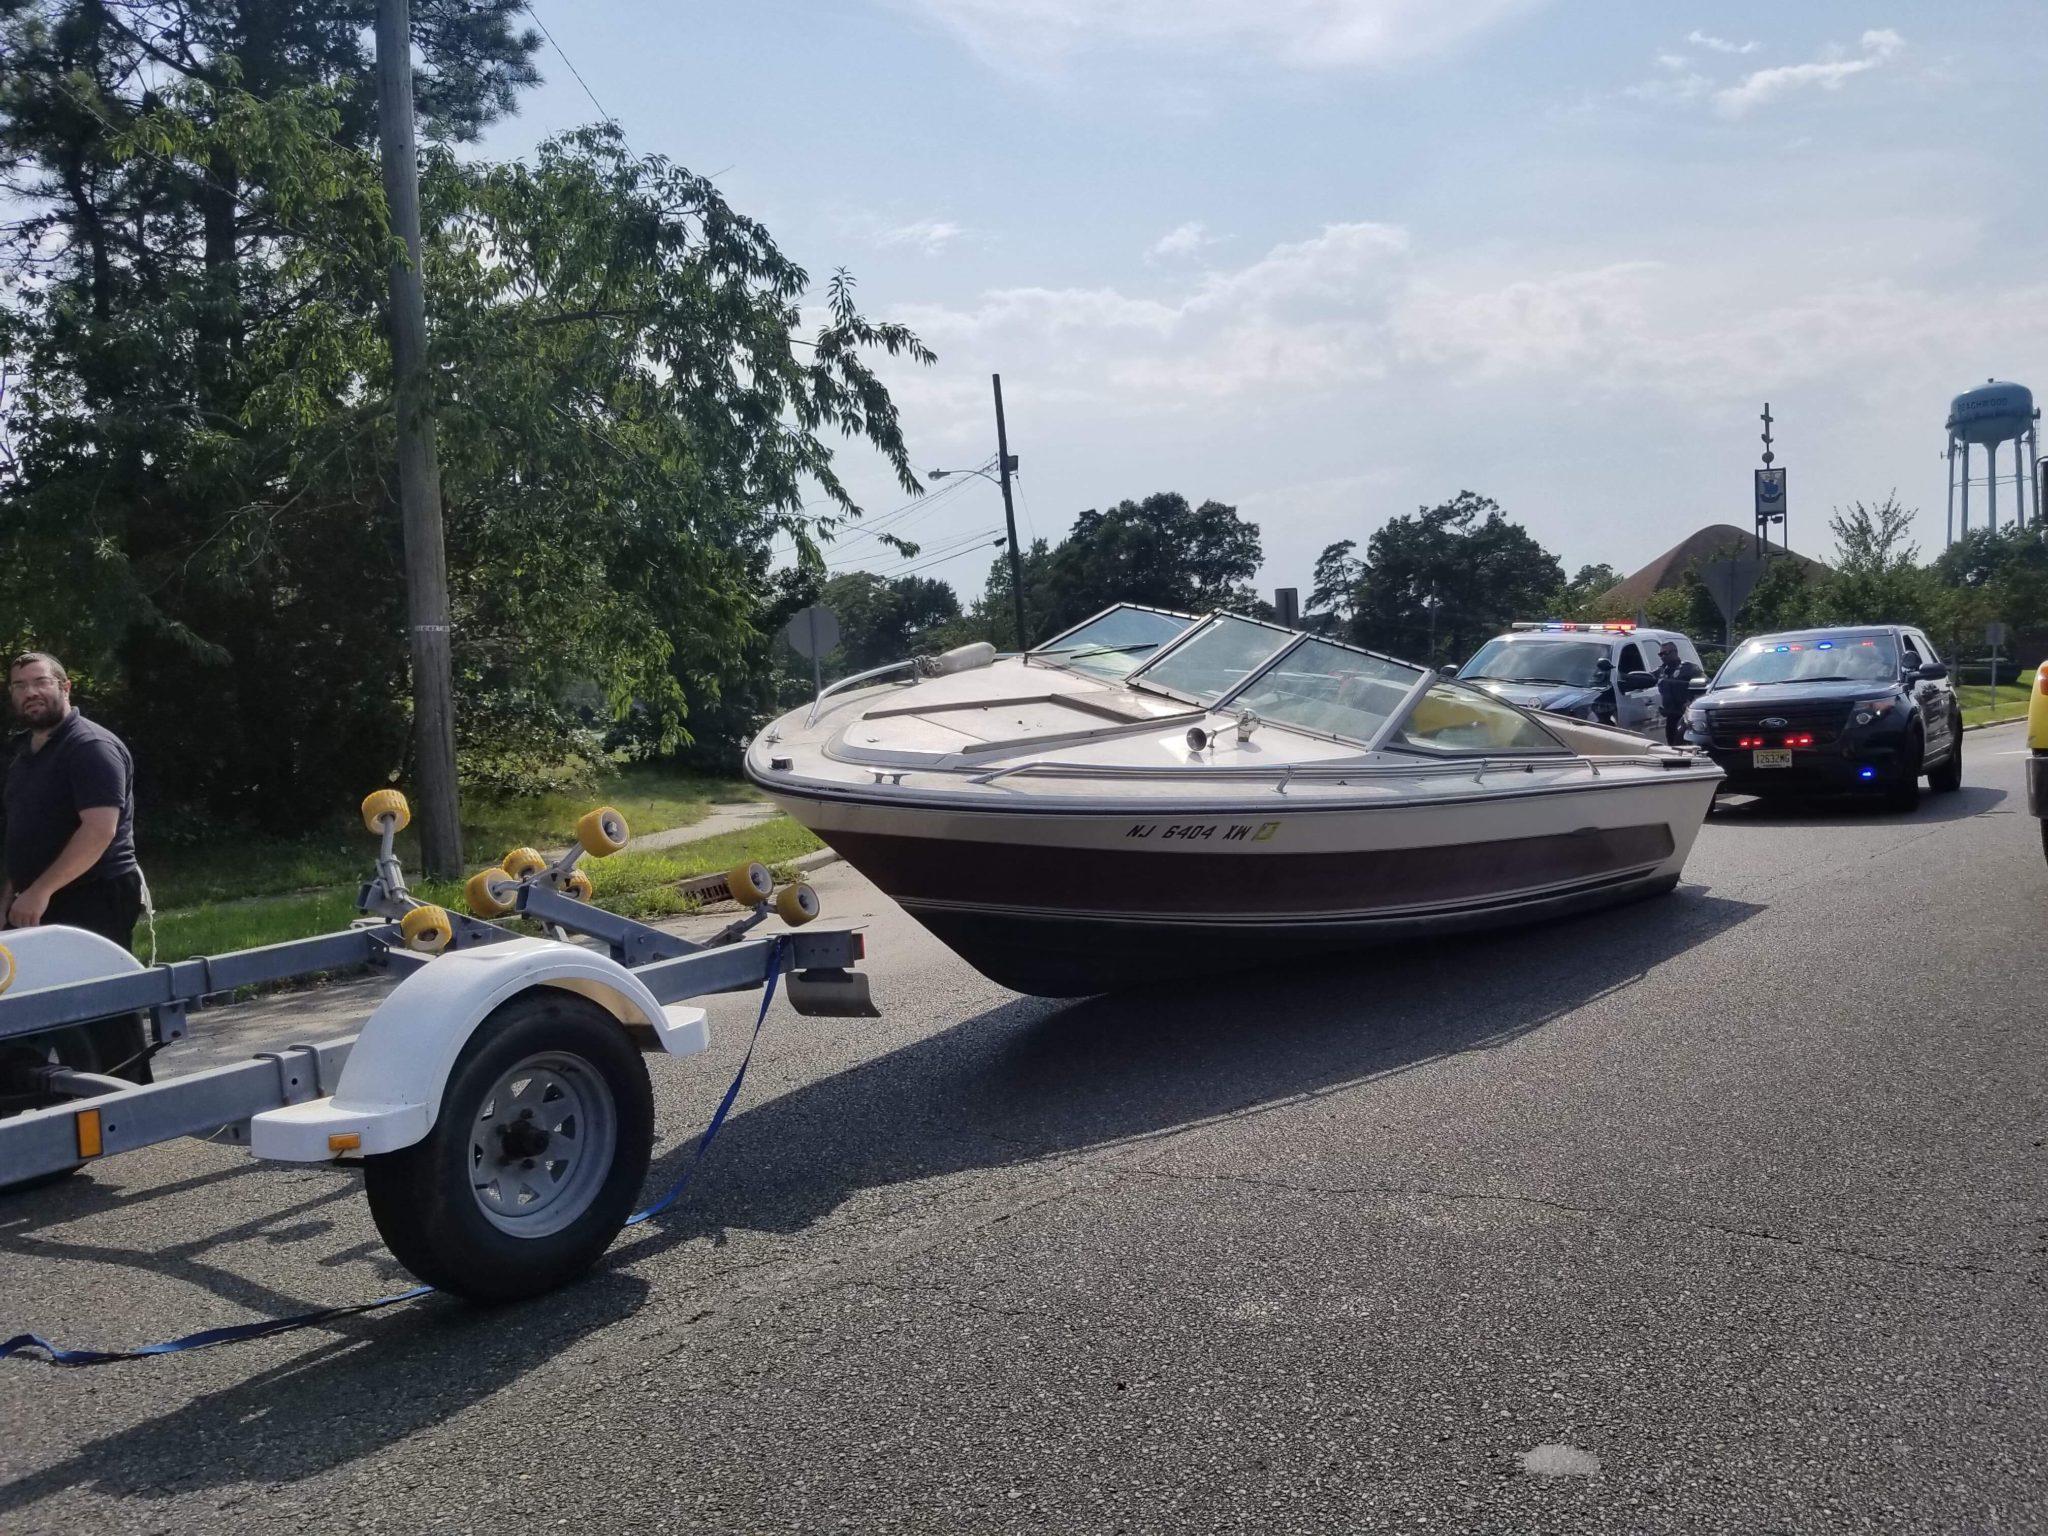 Beachwood: Boat off the Trailer!